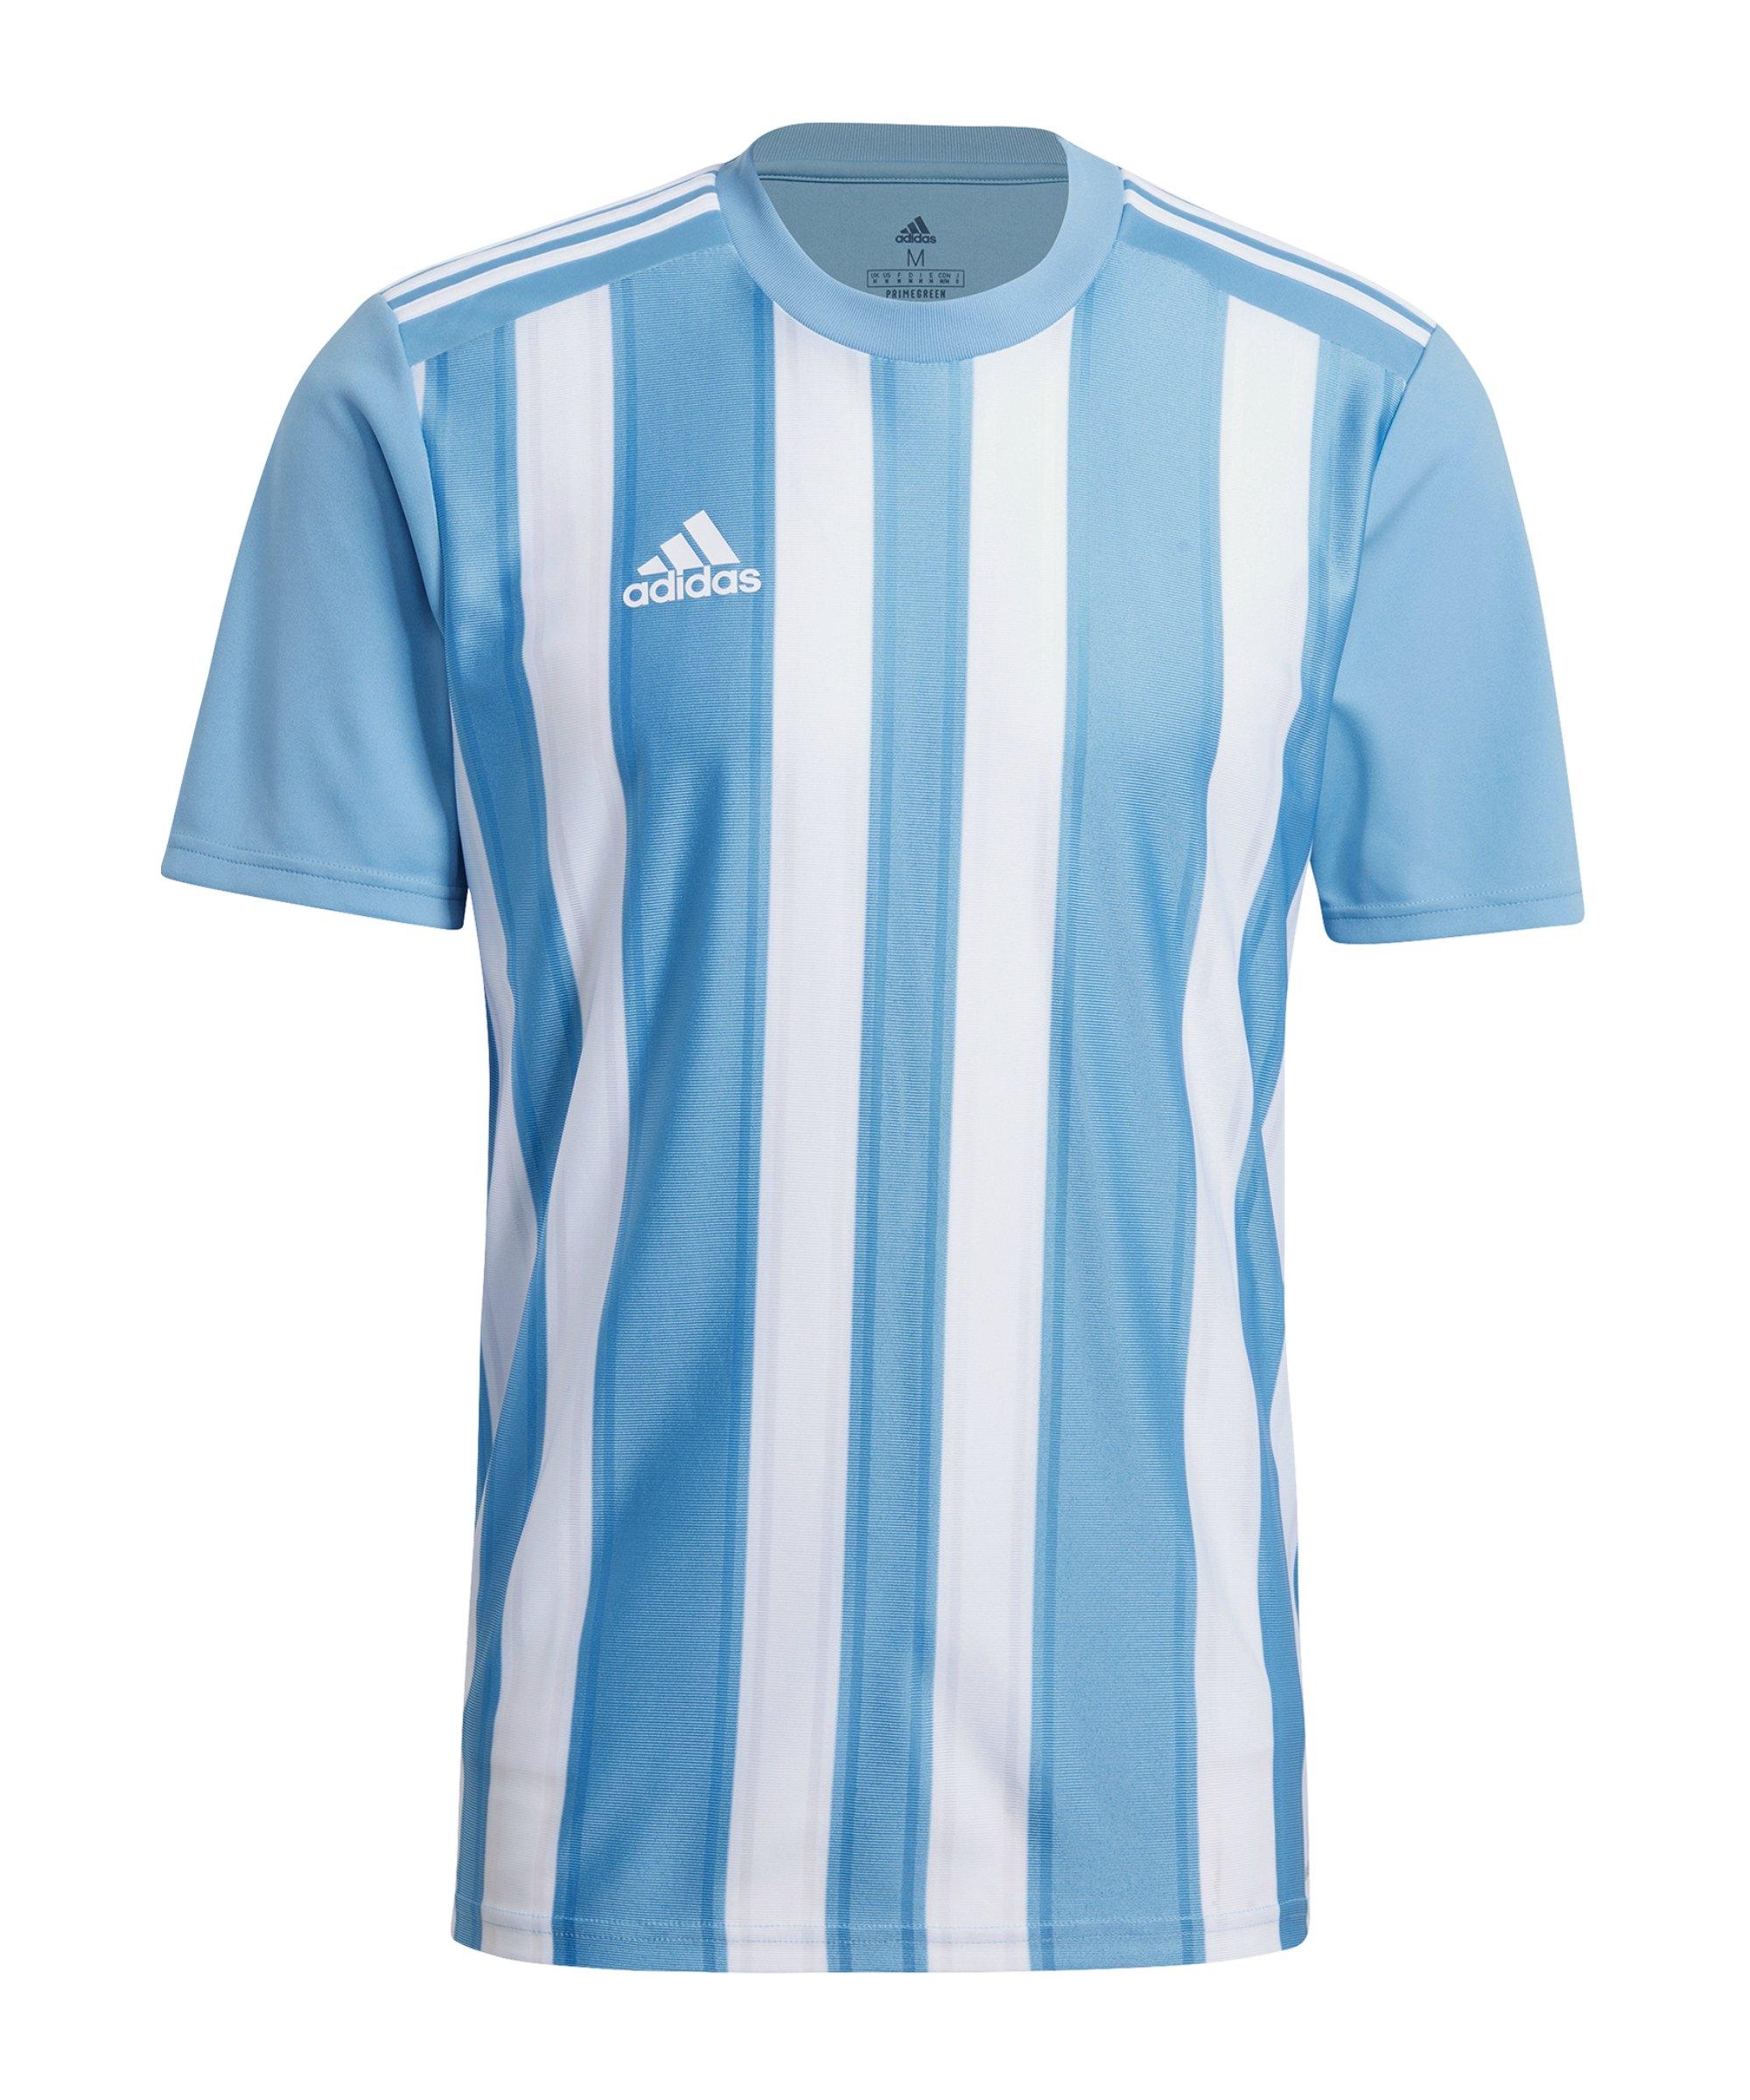 adidas Striped 21 Trikot Hellblau Weiss - blau